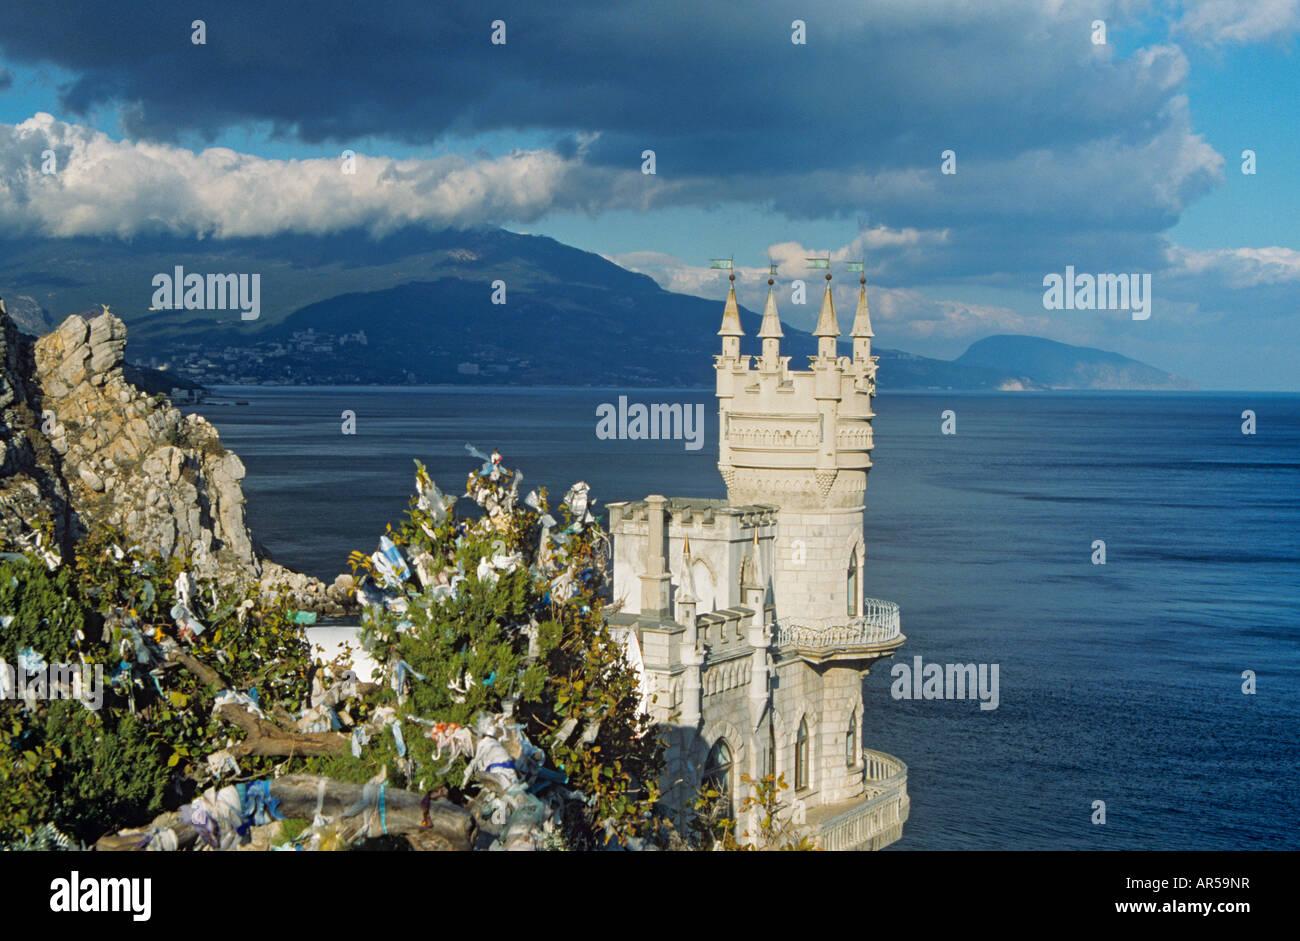 Swallow's nest castle crimea - Stock Image